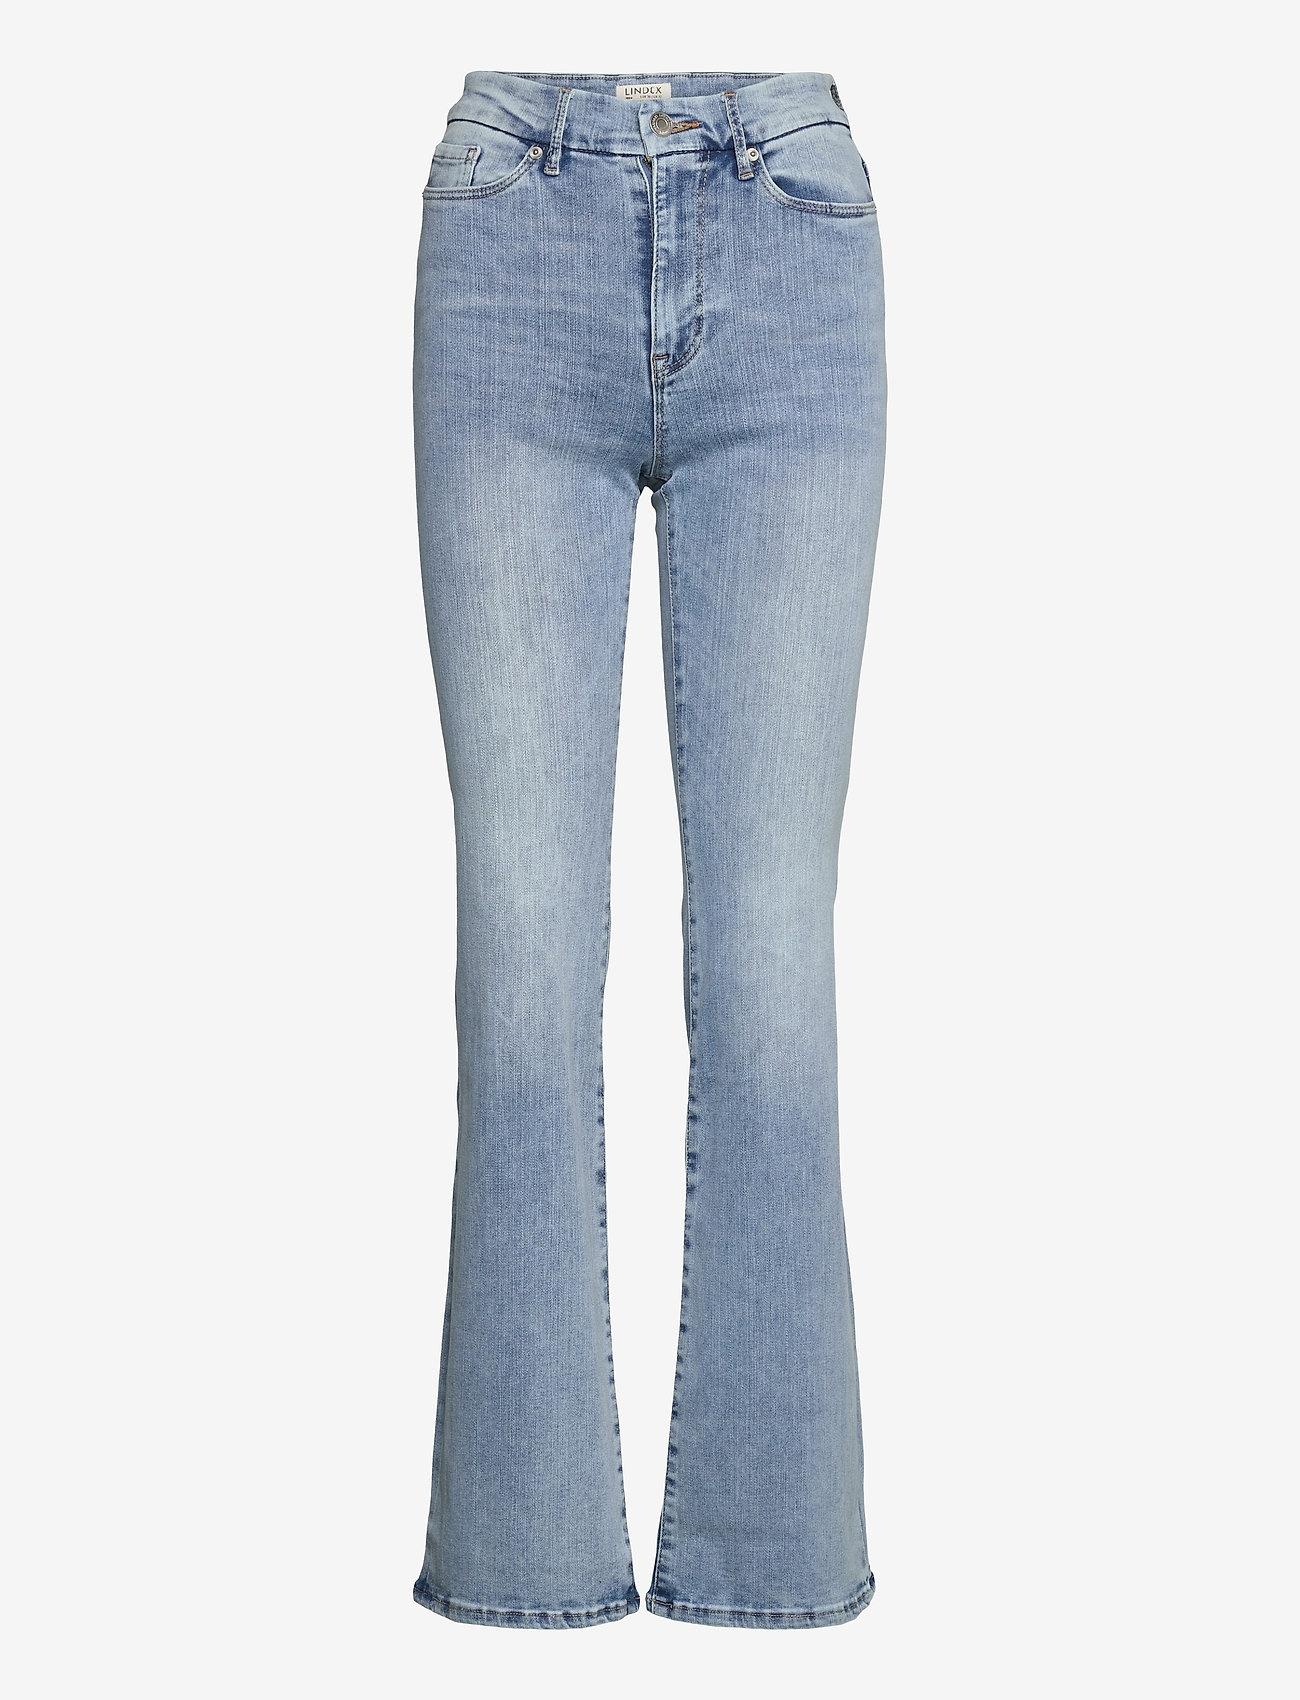 Lindex - Denim trousers Mira lt blue - schlaghosen - blue - 0